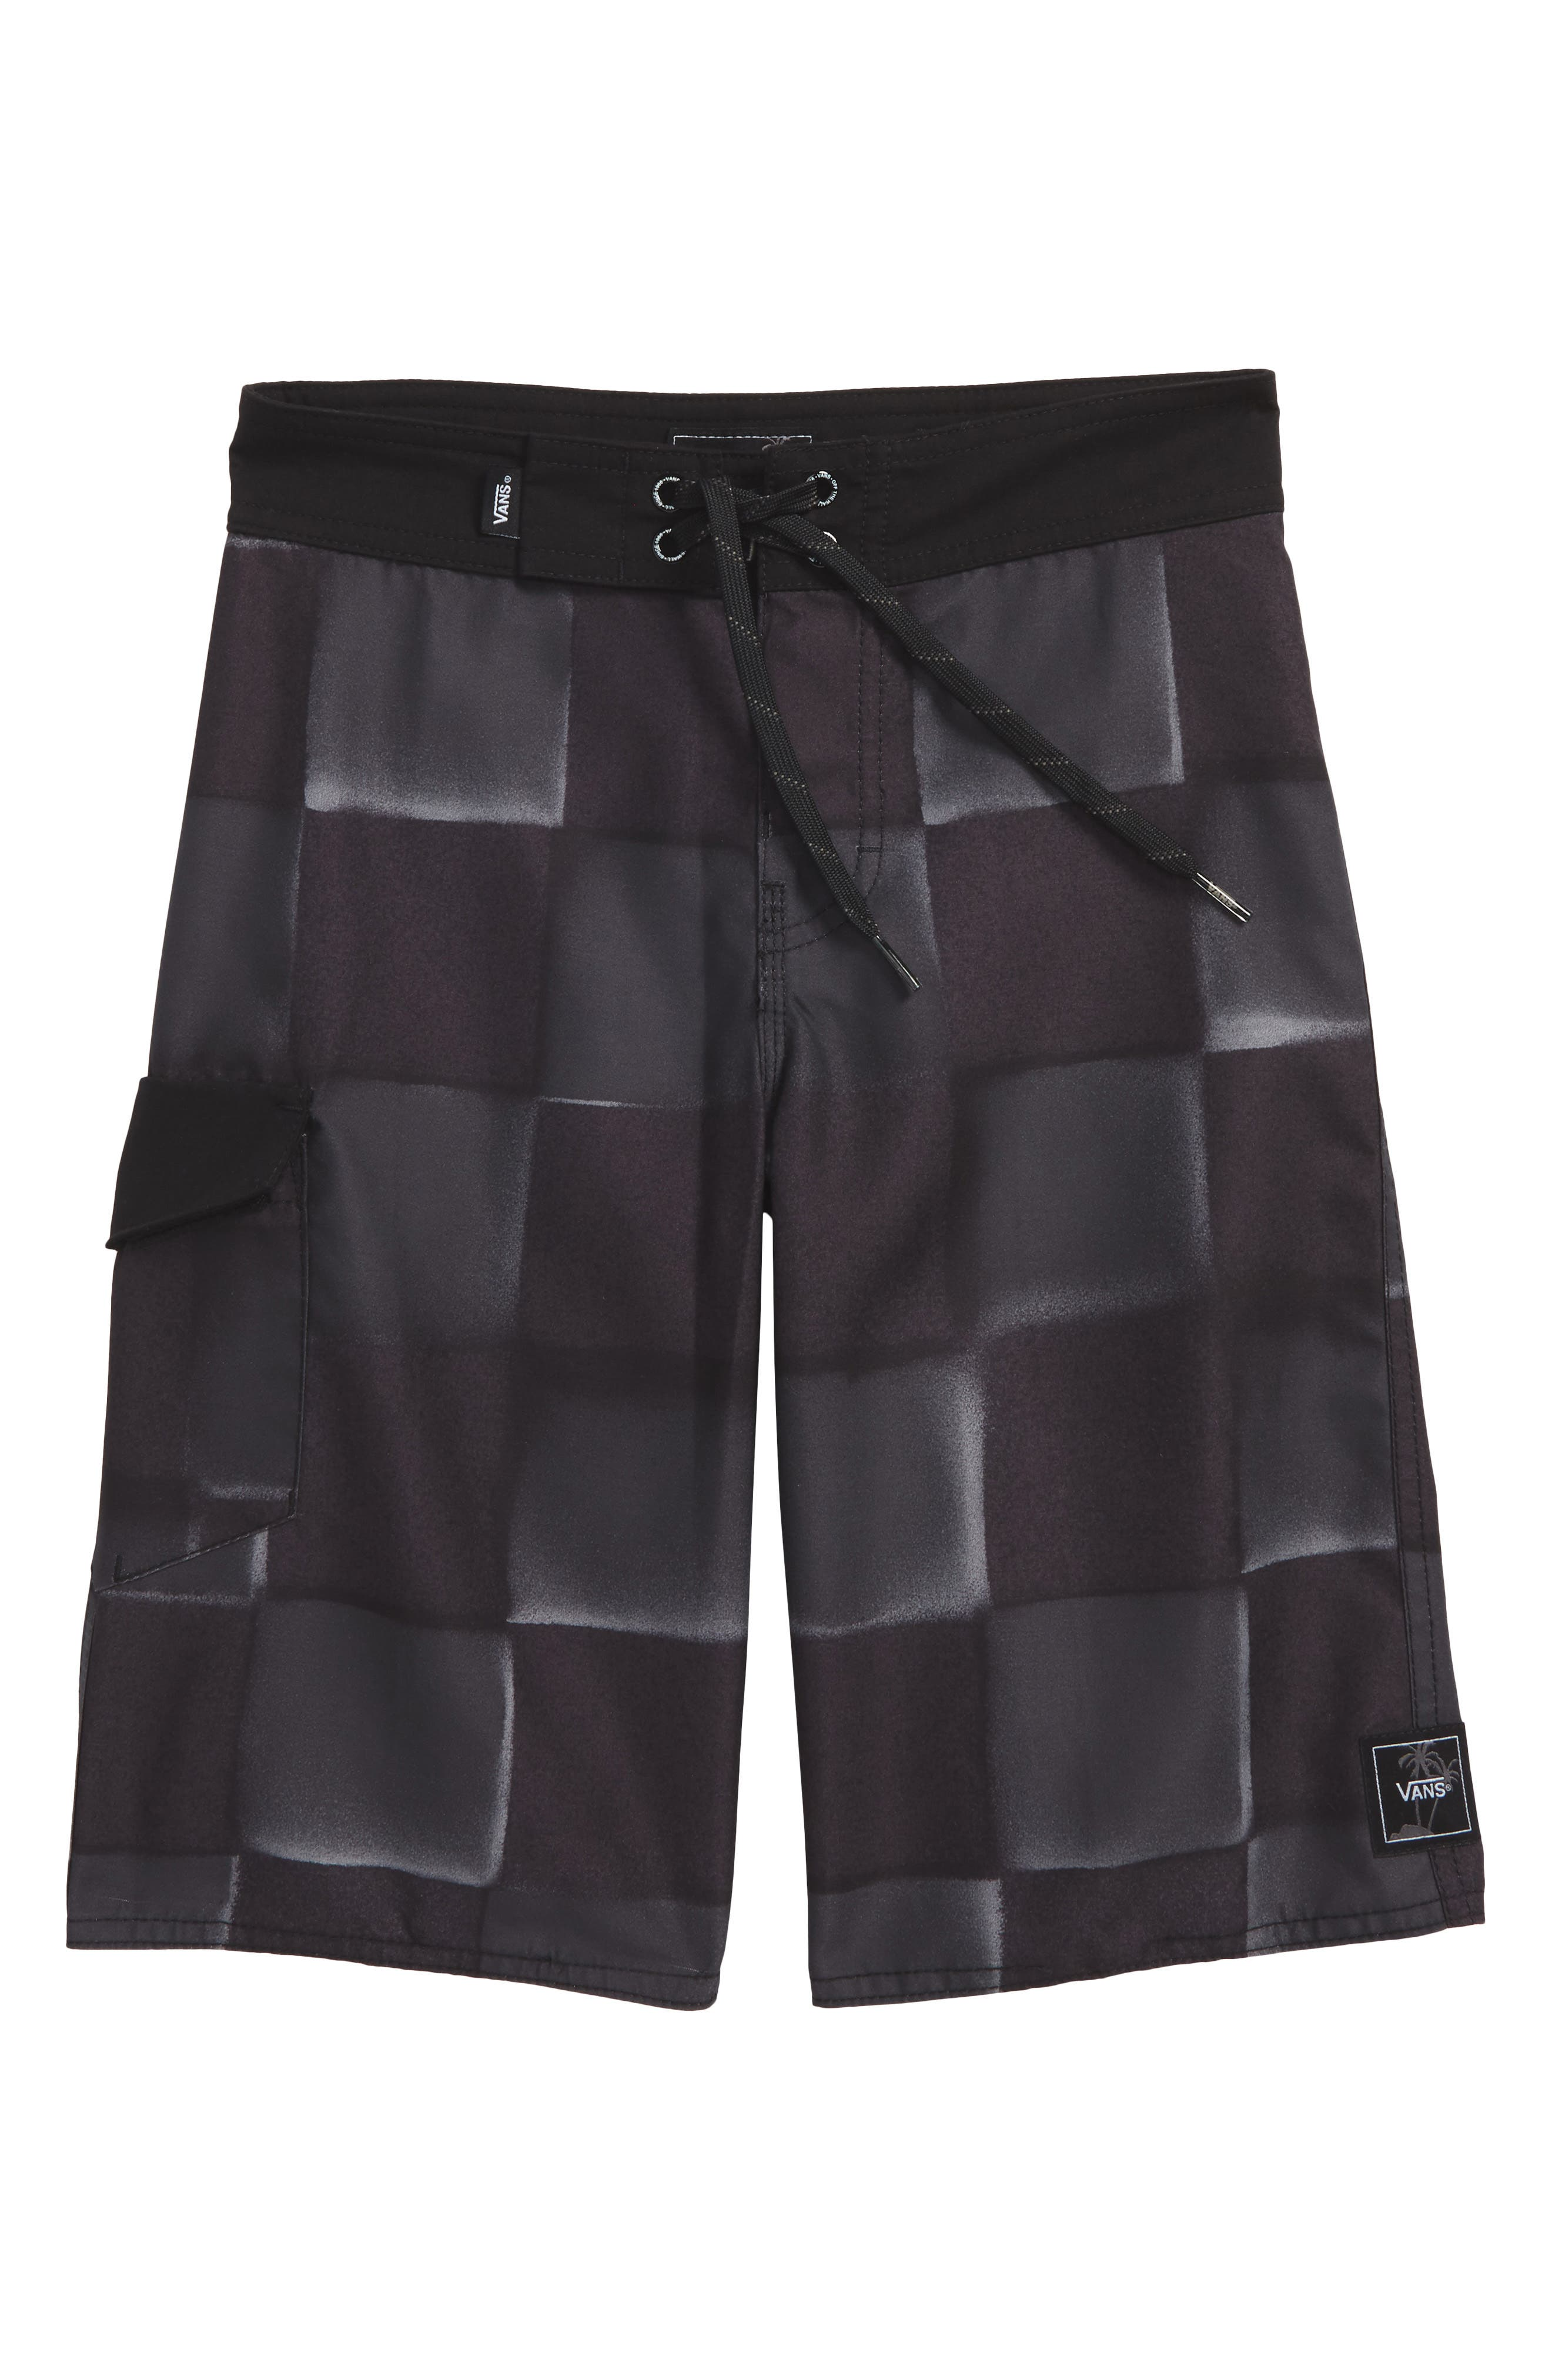 Check Yourself II Board Shorts,                         Main,                         color, 001